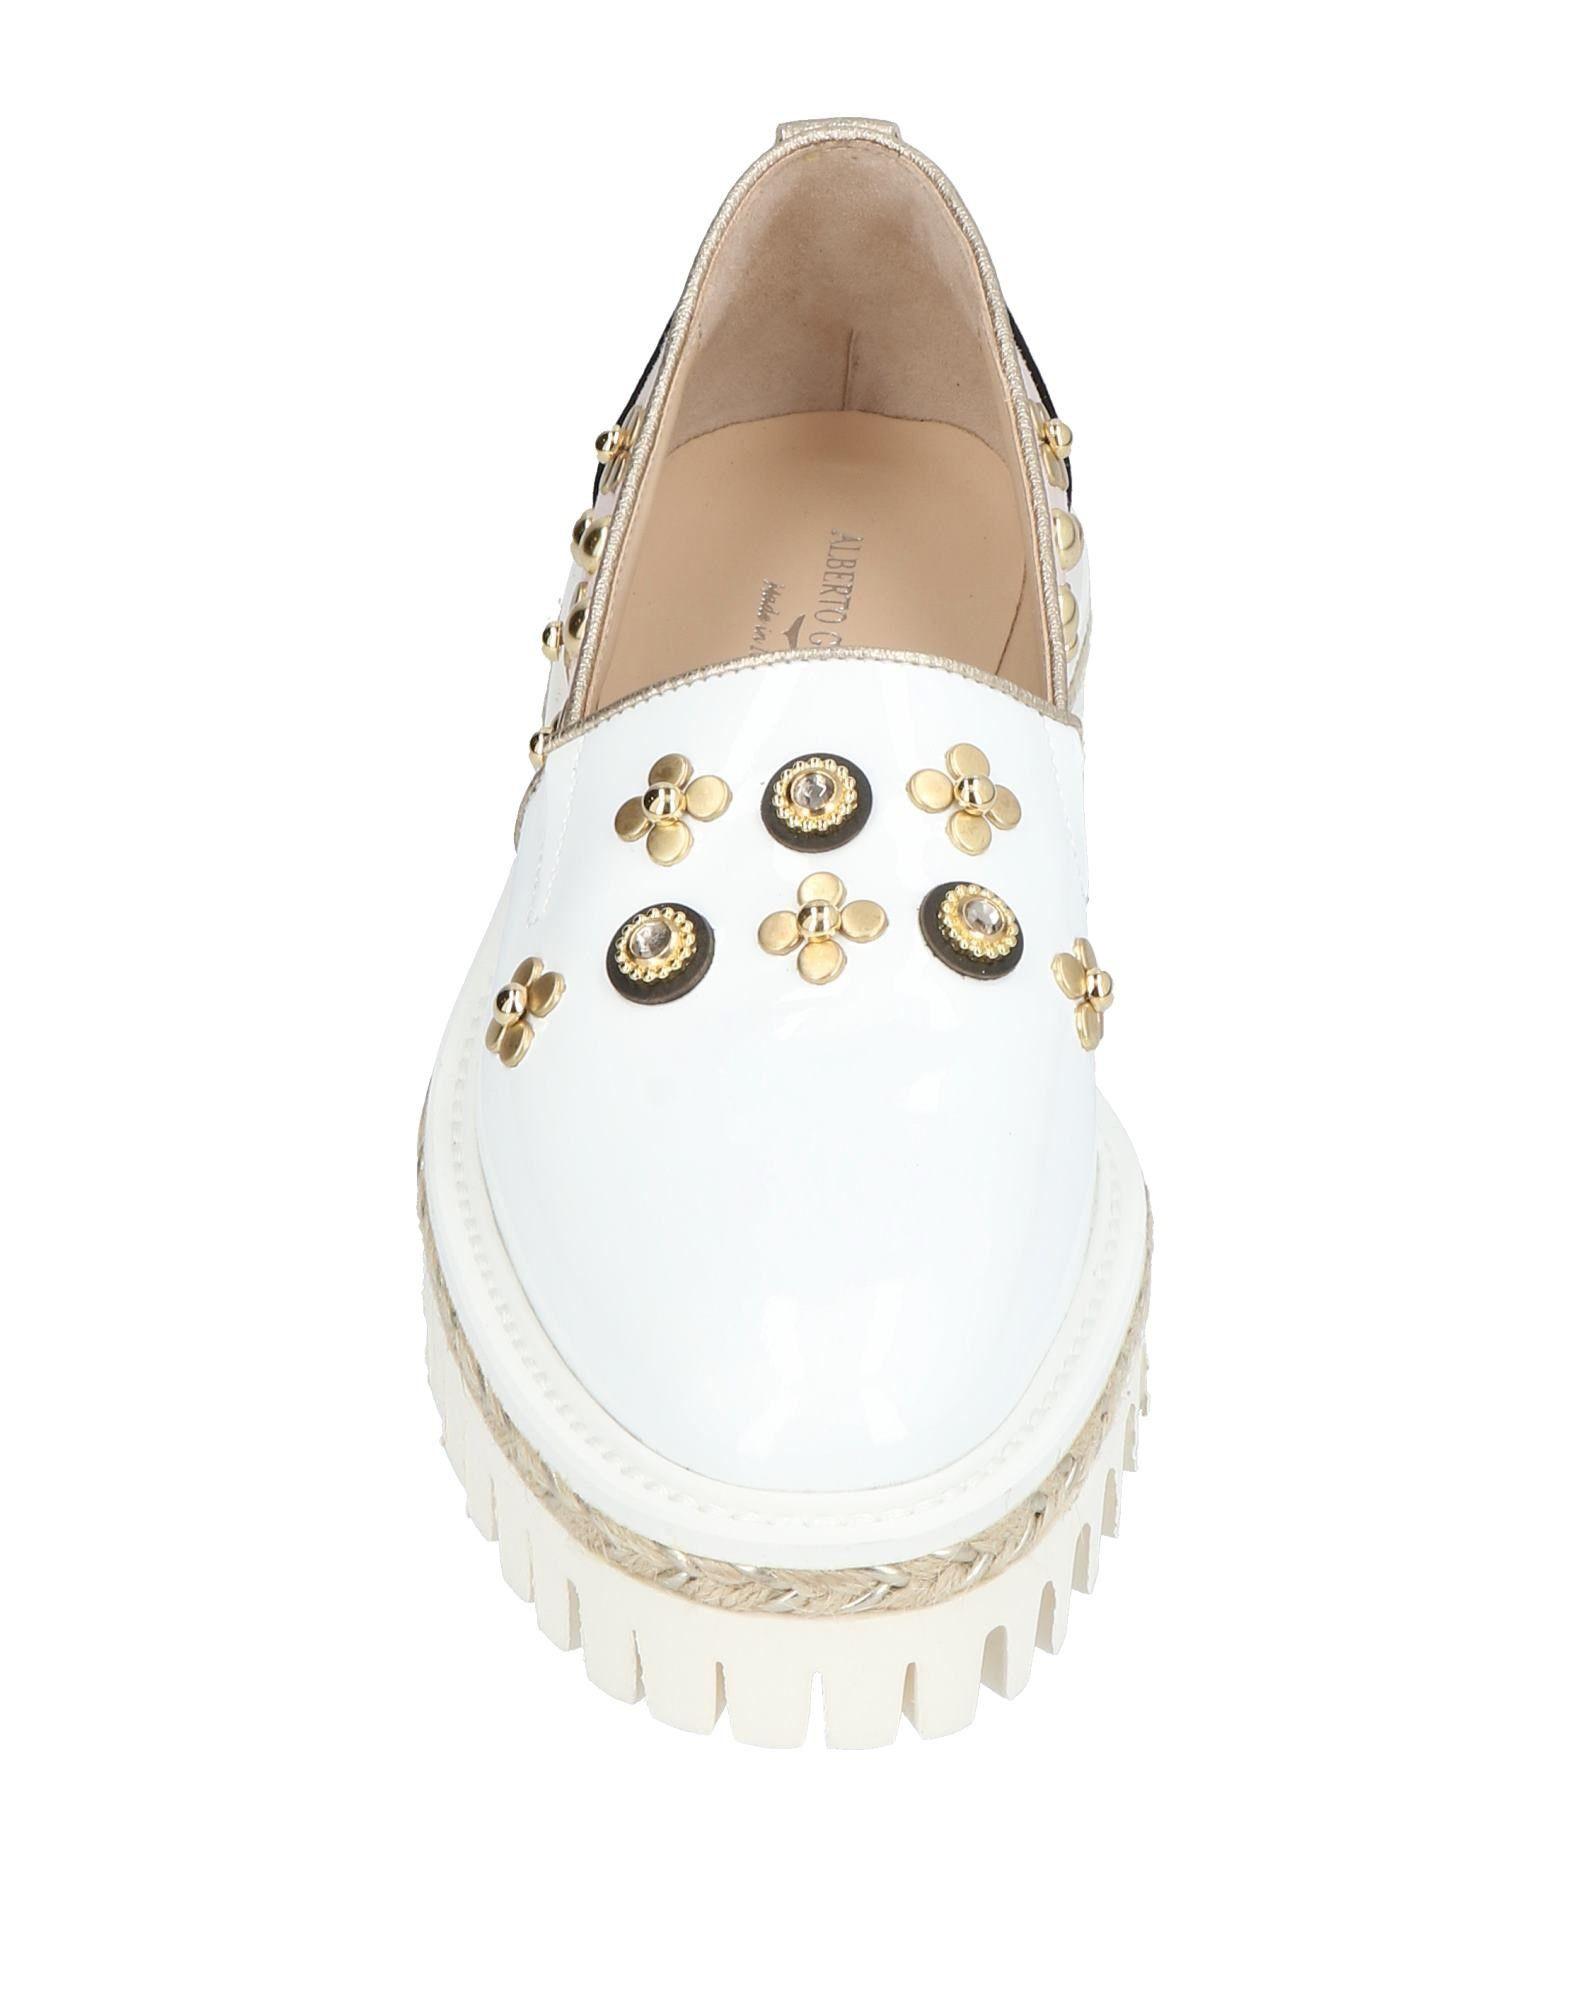 Gut um billige Schuhe Damen zu tragenAlberto Guardiani Sneakers Damen Schuhe  11426330GS 272d79